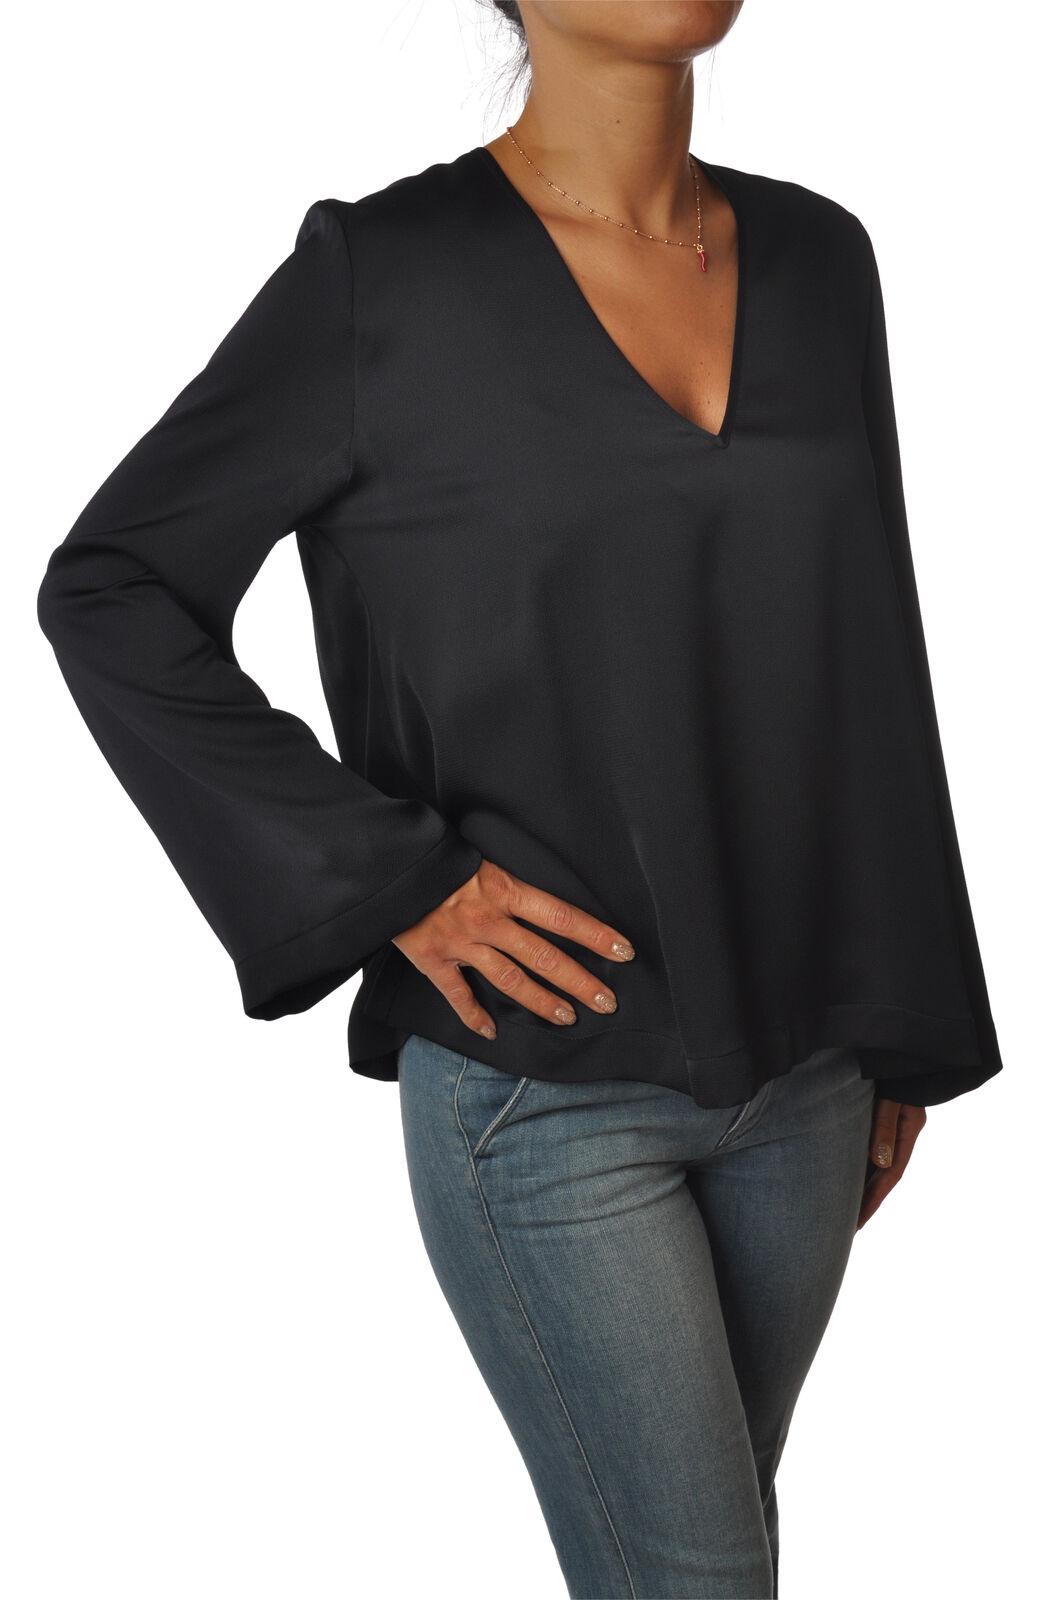 Rame - Shirts-Blouses - Woman - bluee - 5518412D190650